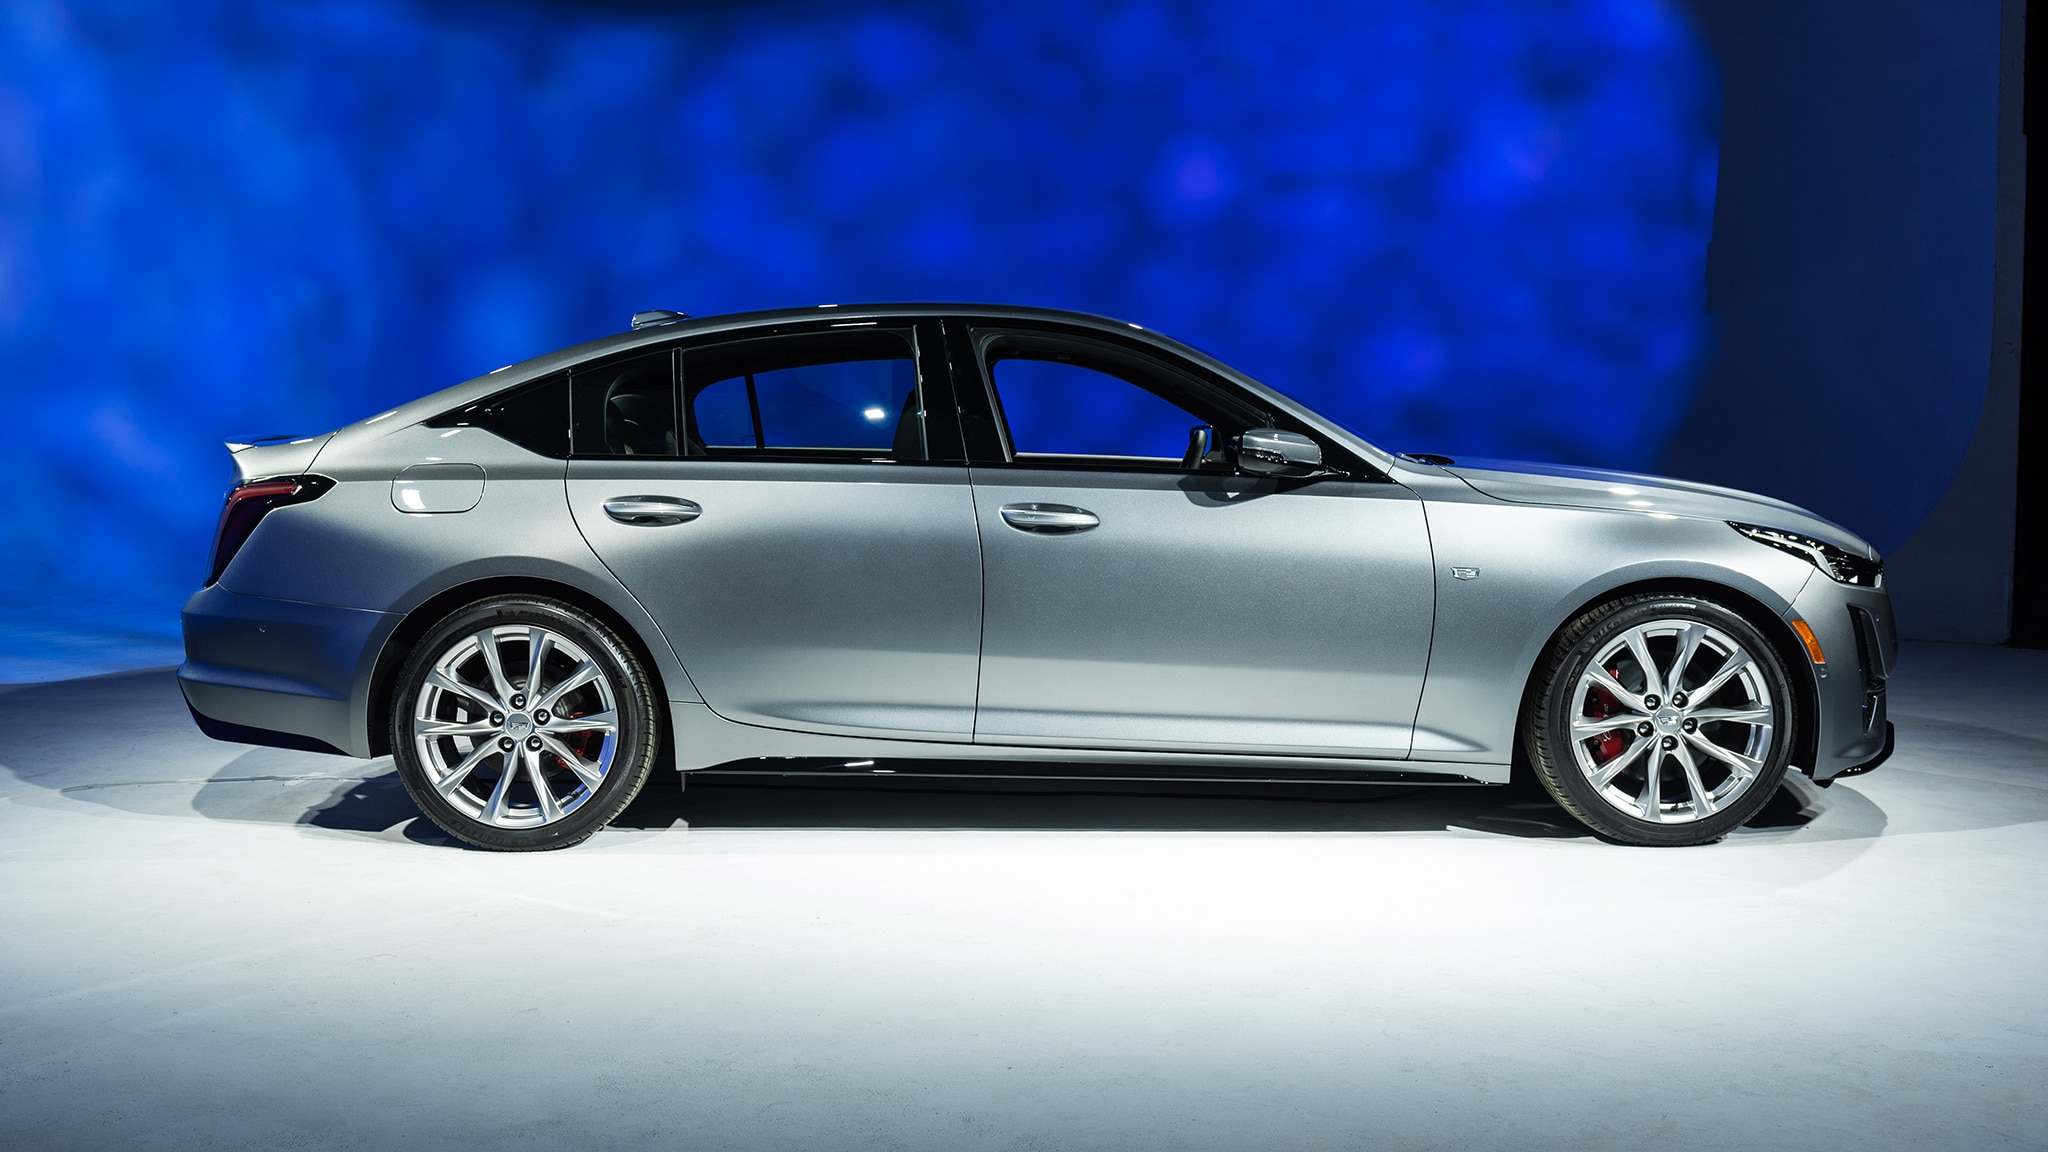 2020 Cadillac CT5: Stuff Cadillac Told Us | Automobile ...